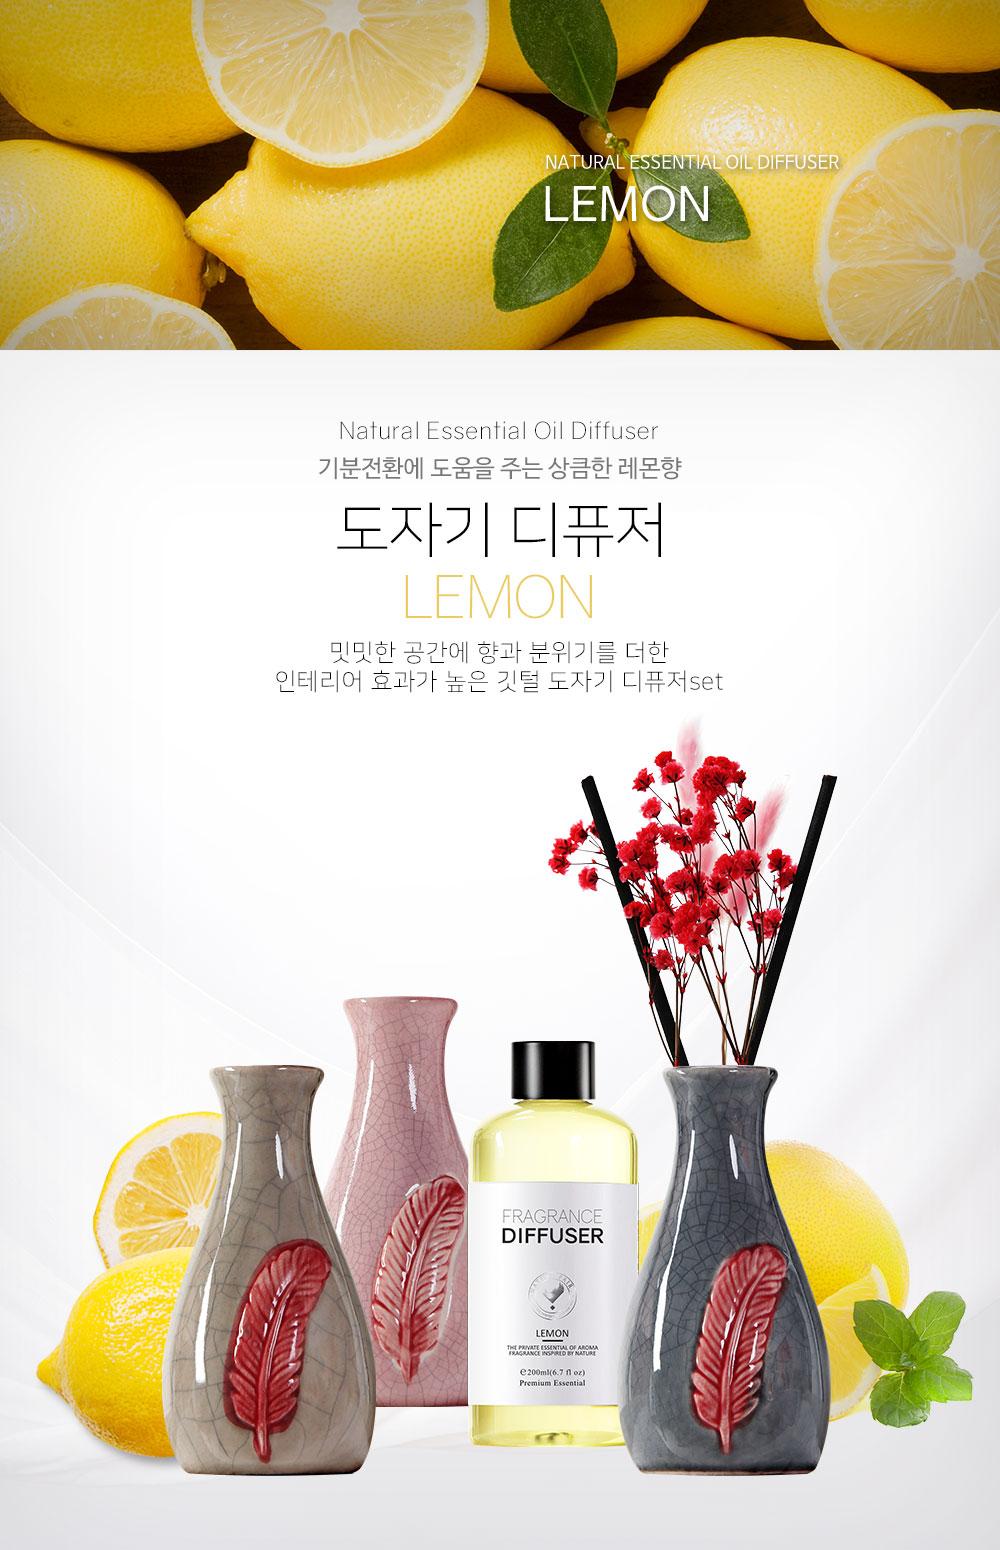 setDiffuser-ceramic_lemon_01.jpg